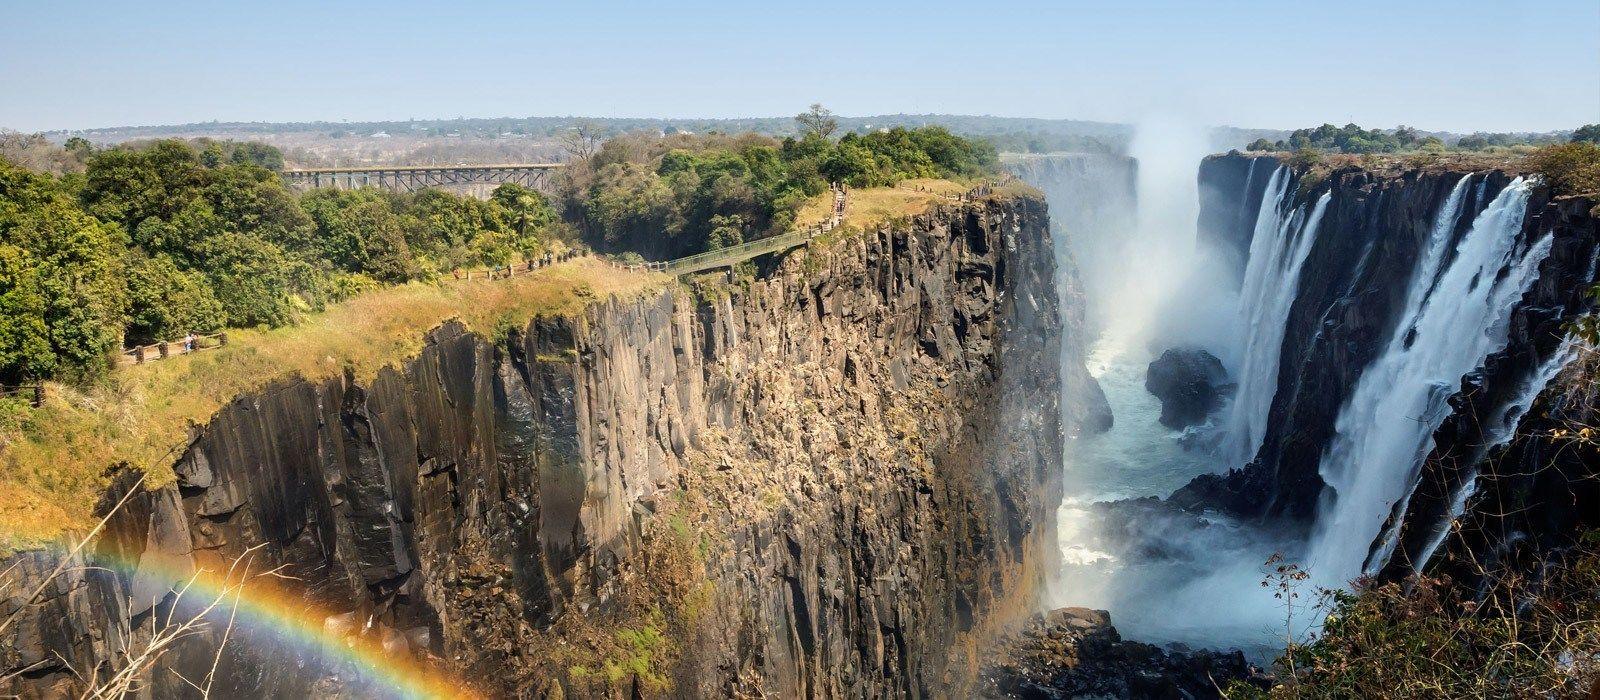 Südafrika, Sambia & Botswana: Safaris, Wein und Wasserfälle Urlaub 1